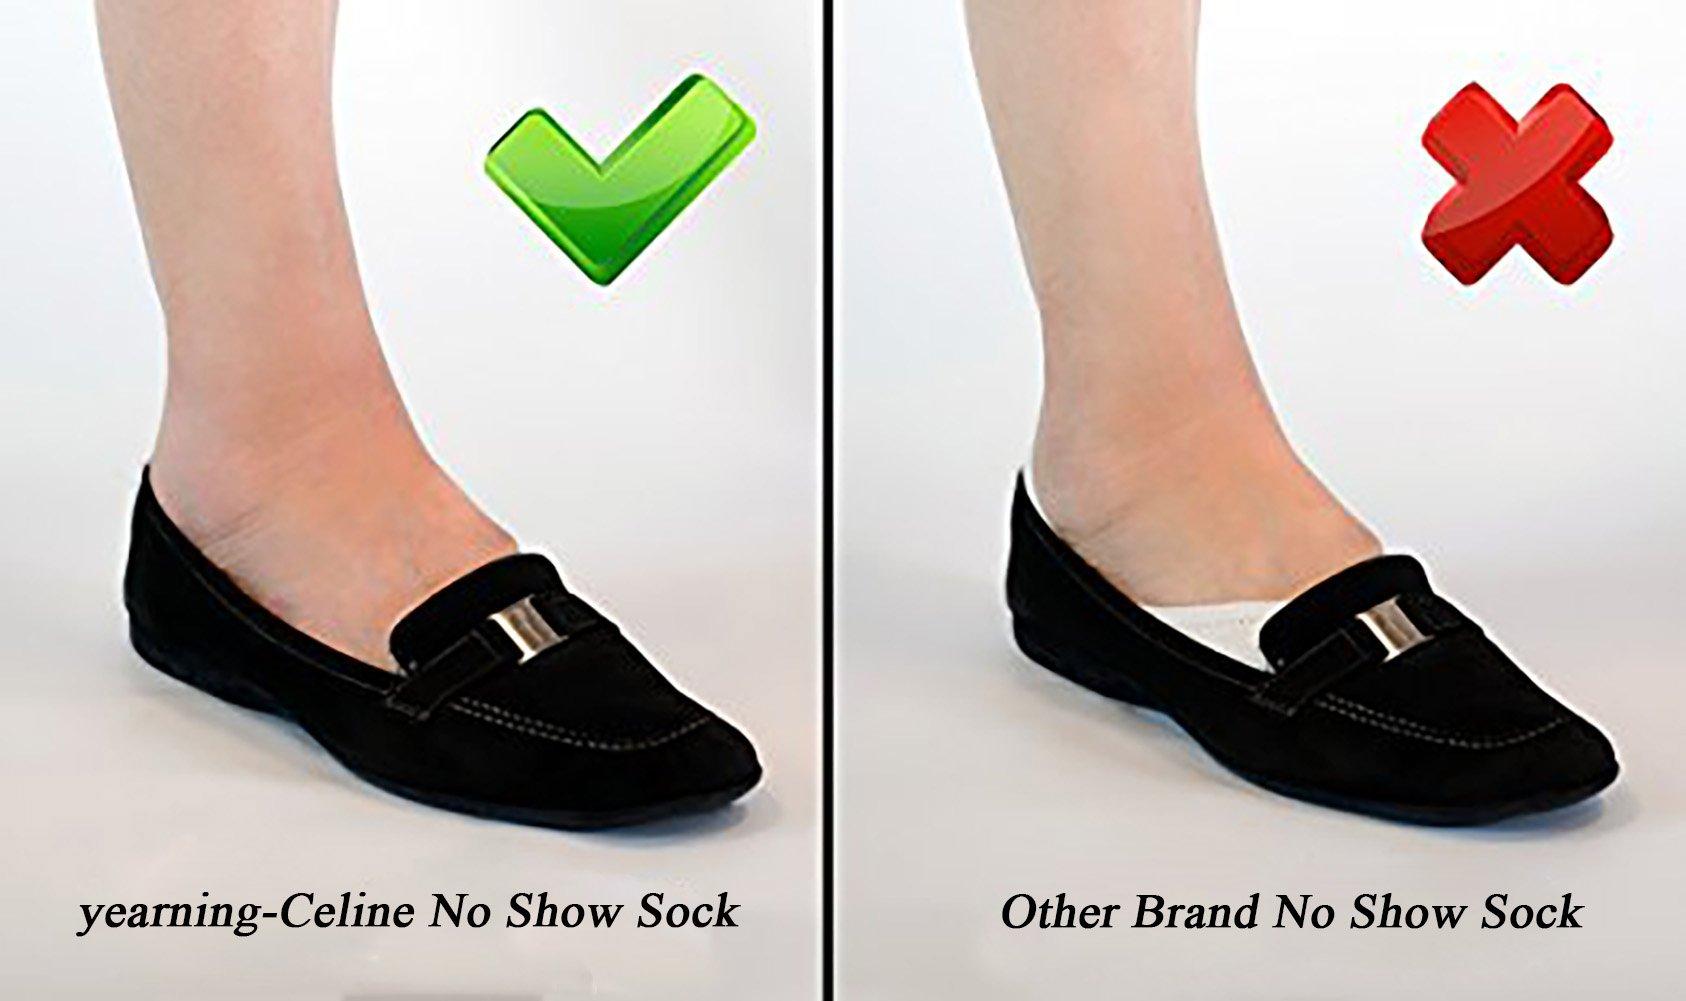 Women No Show Socks Cotton Liner Socks Non-Slip No Show Socks Low Cut Boat Socks 5-Pairs by Ayiran (Image #4)